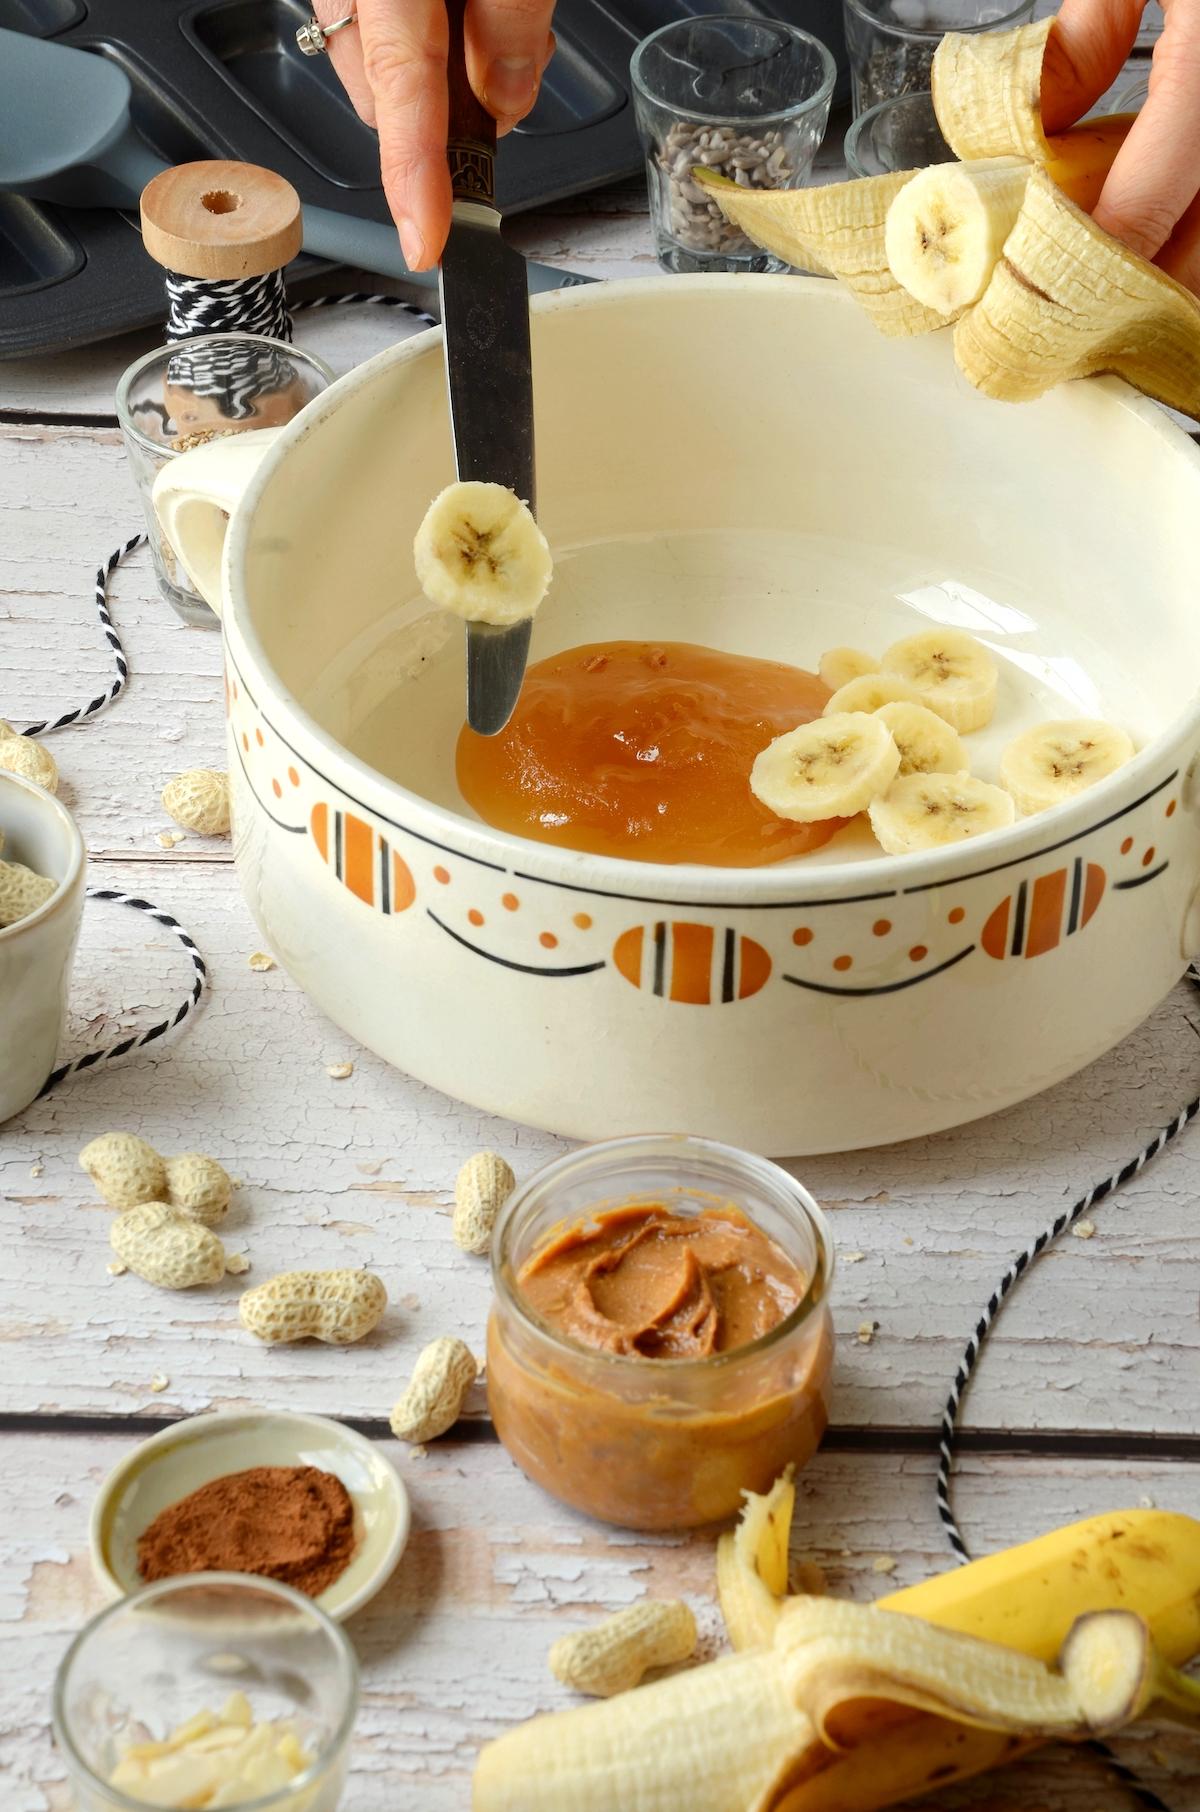 cuisine fait-maison dessert banane